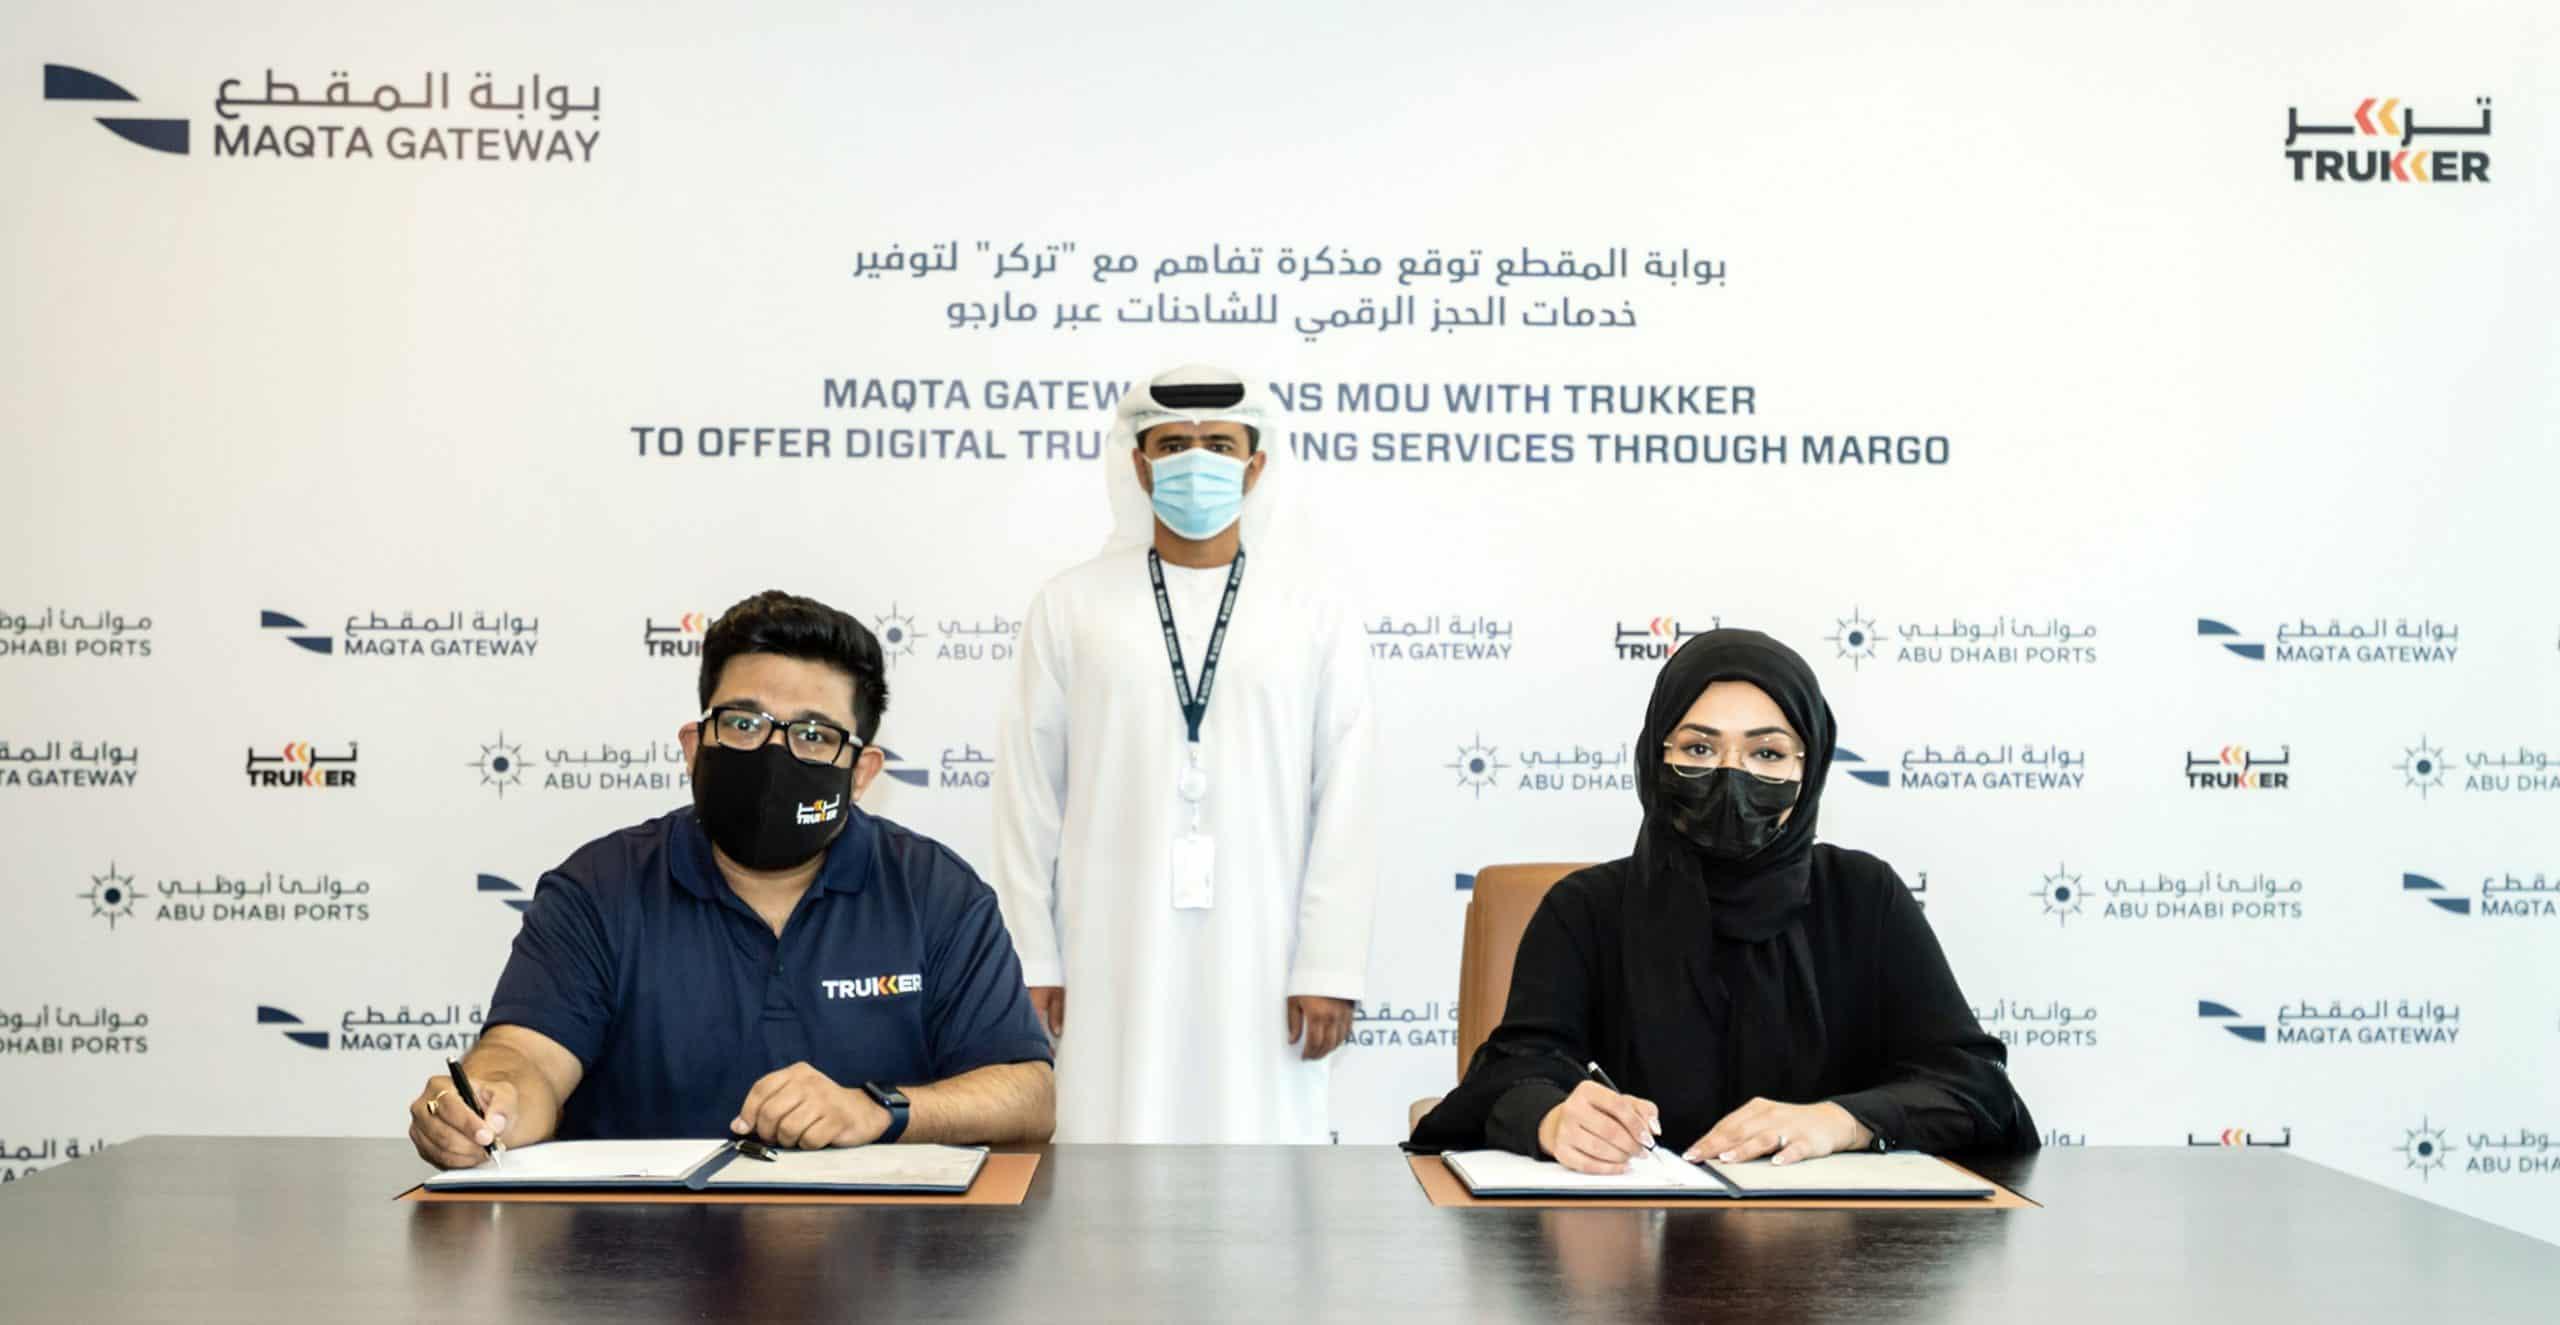 Maqta Gateway and TruKKer collaborate on digital truck bookings